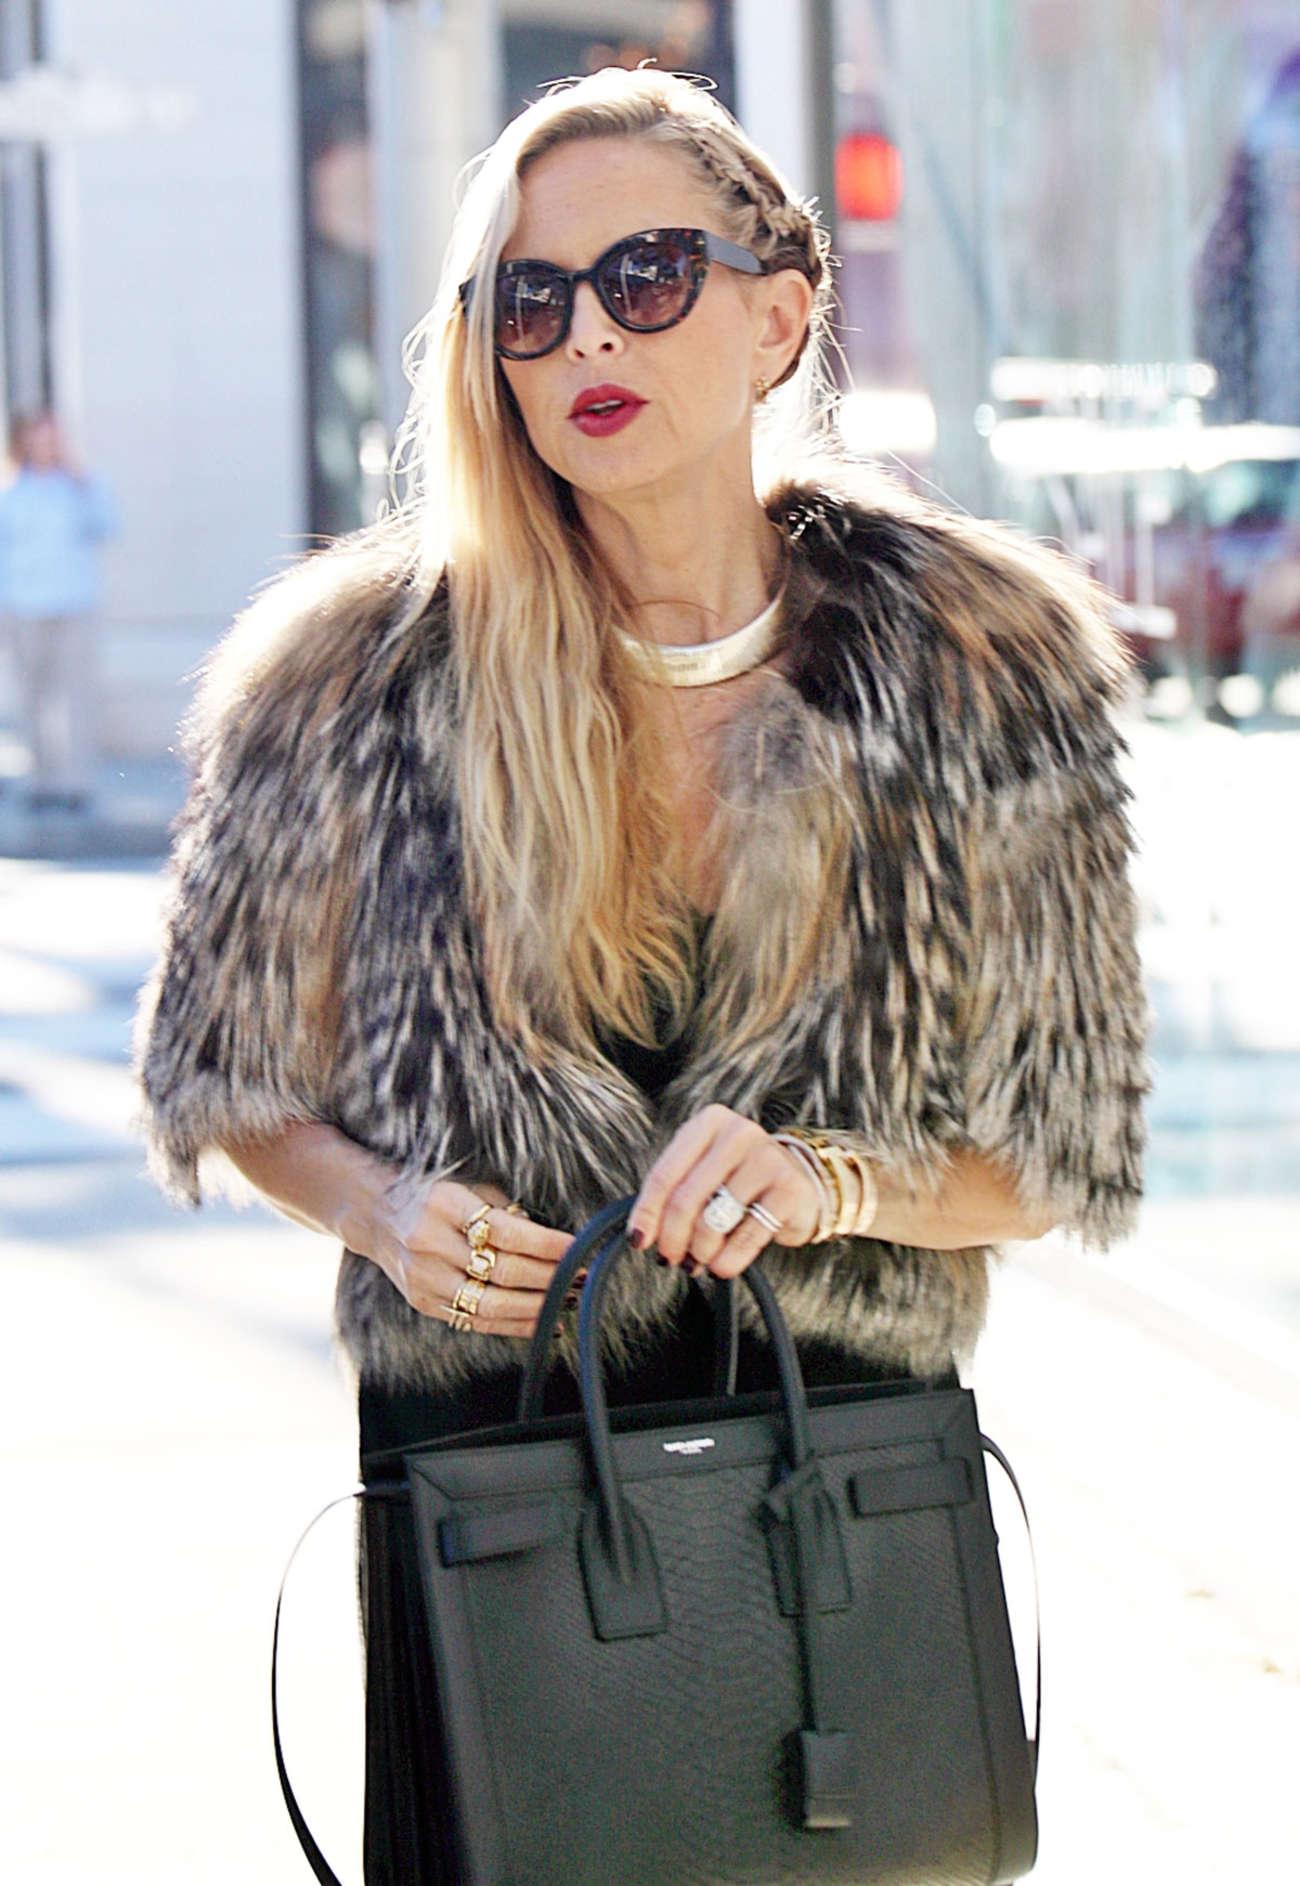 Rachel Zoe Shopping at The Gap in Los Angeles